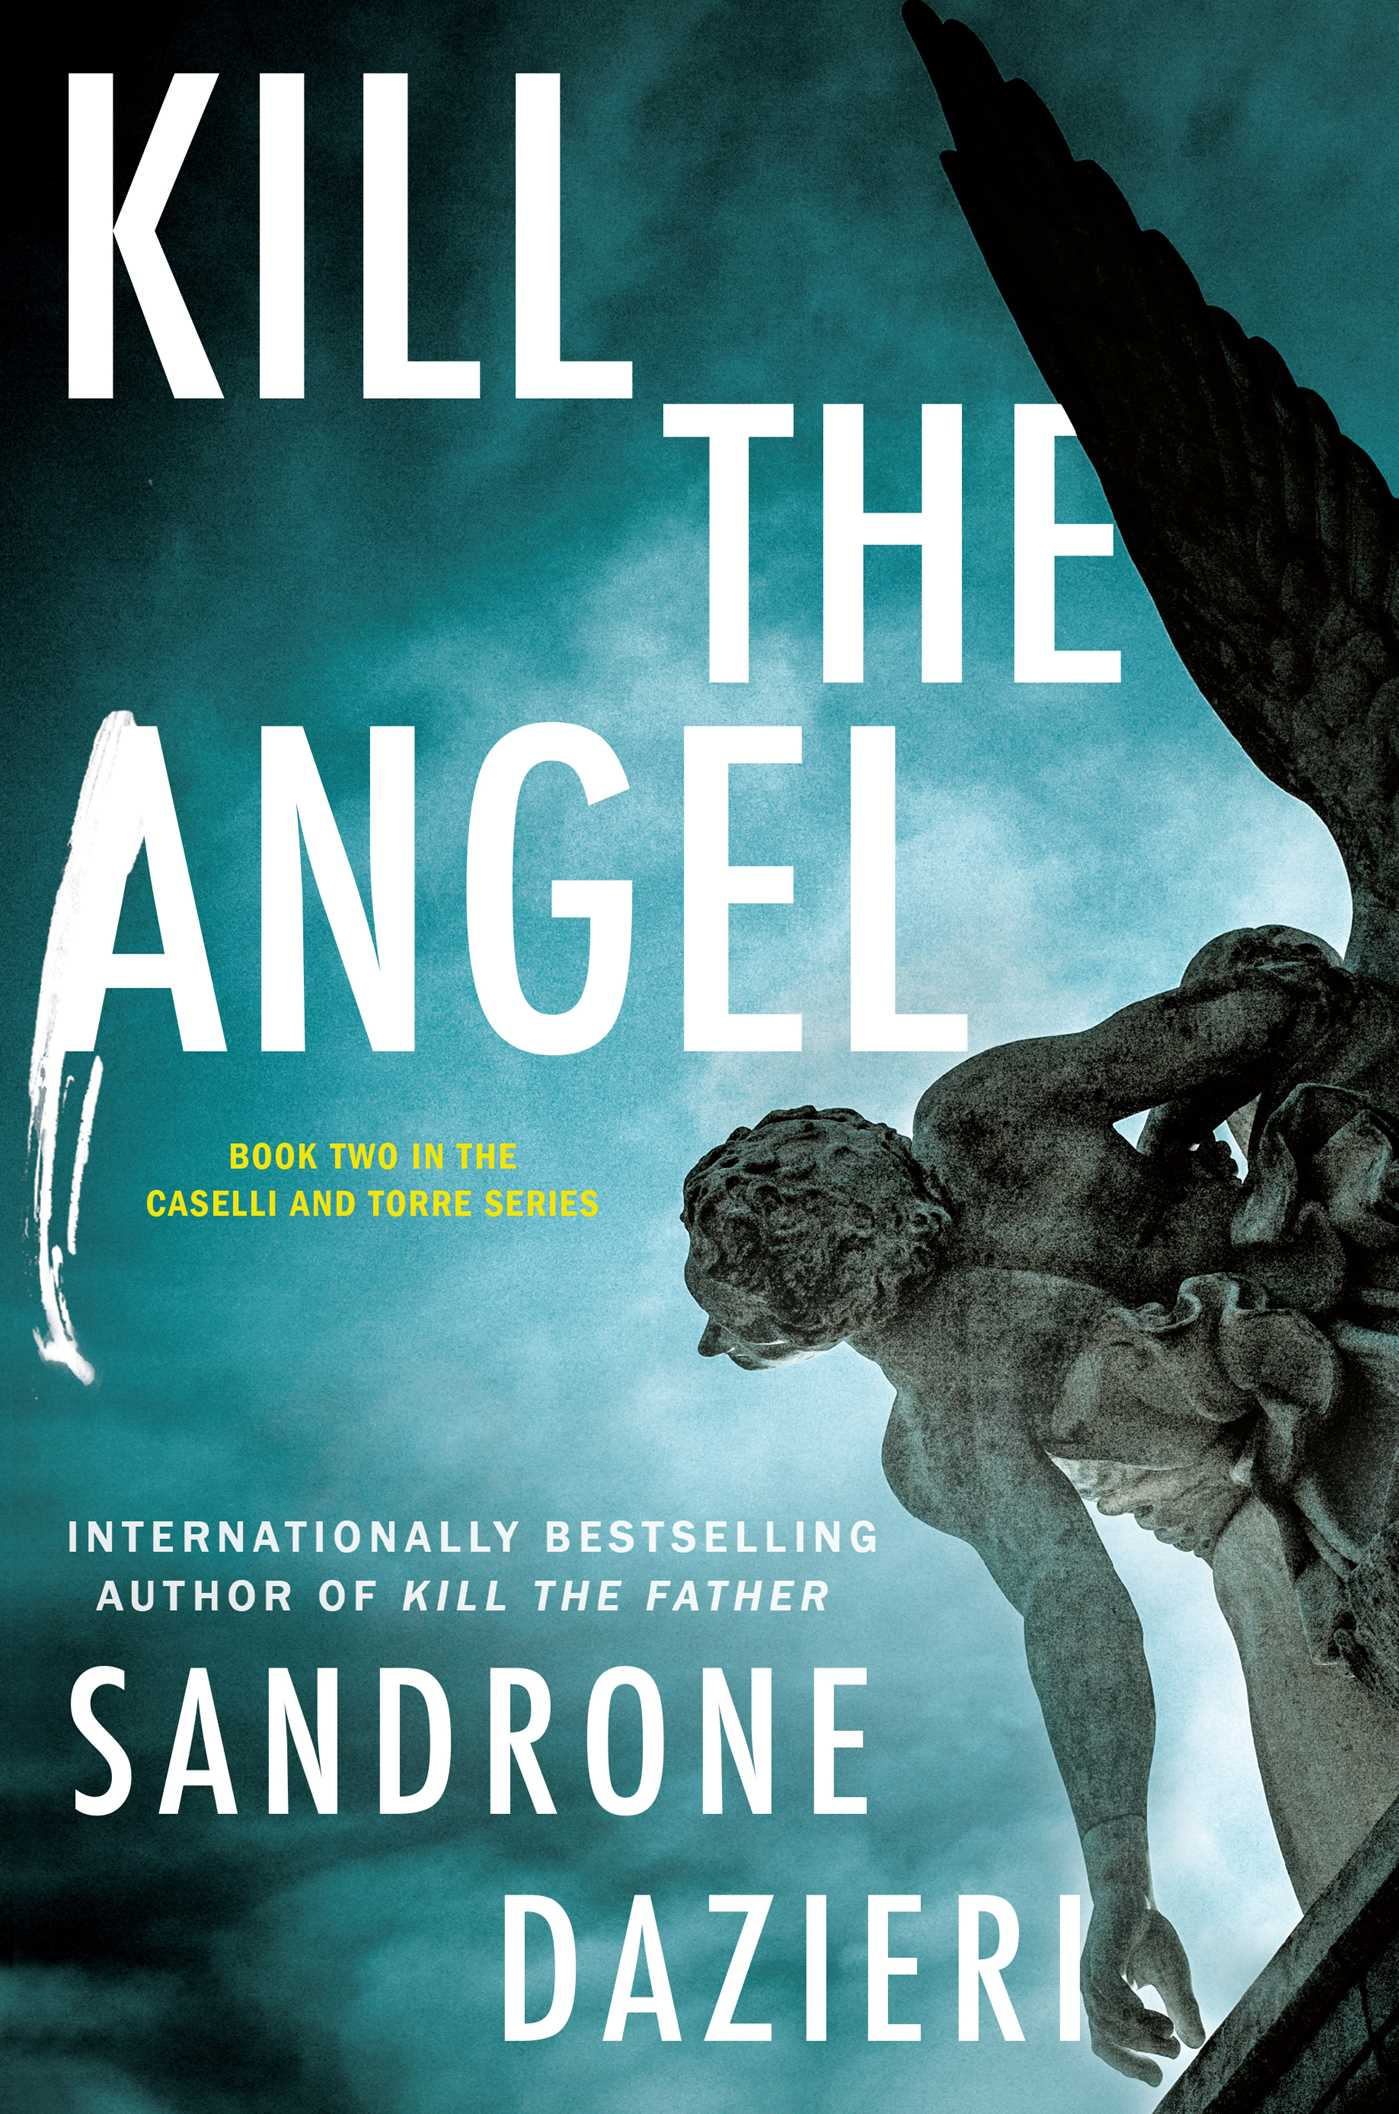 Kill the angel 9781501174650 hr